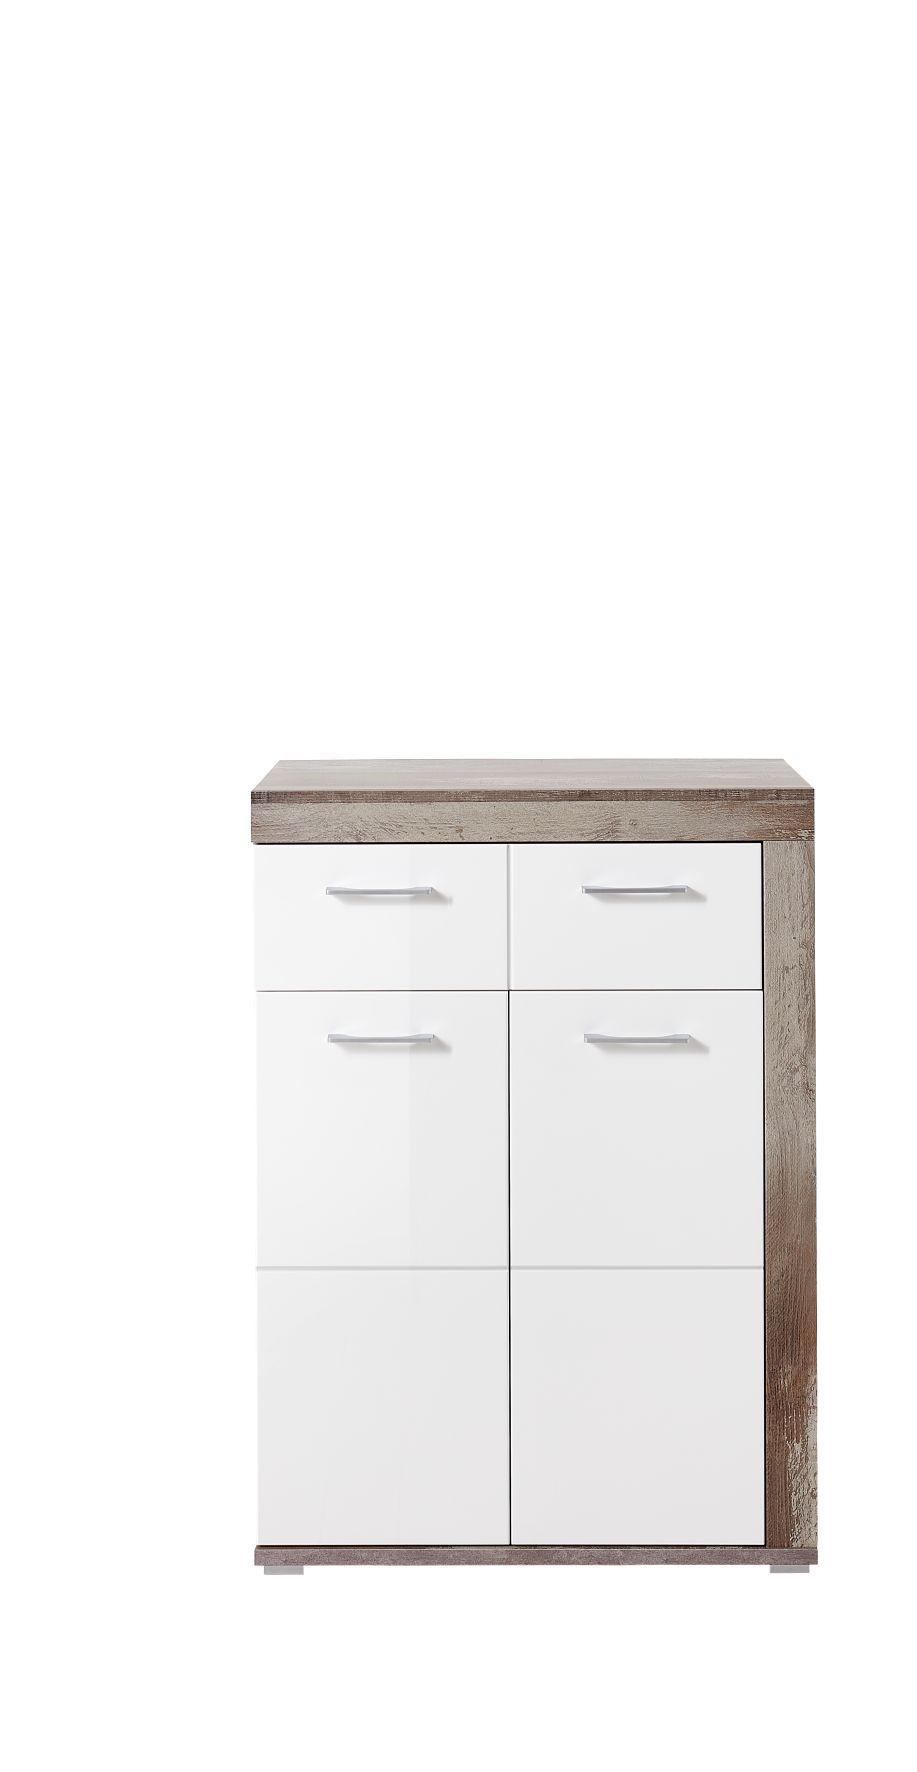 Cabinet din pal si MDF, cu 1 sertar si 2 usi Krone Alb / Natur, l77xA38xH107 cm imagine